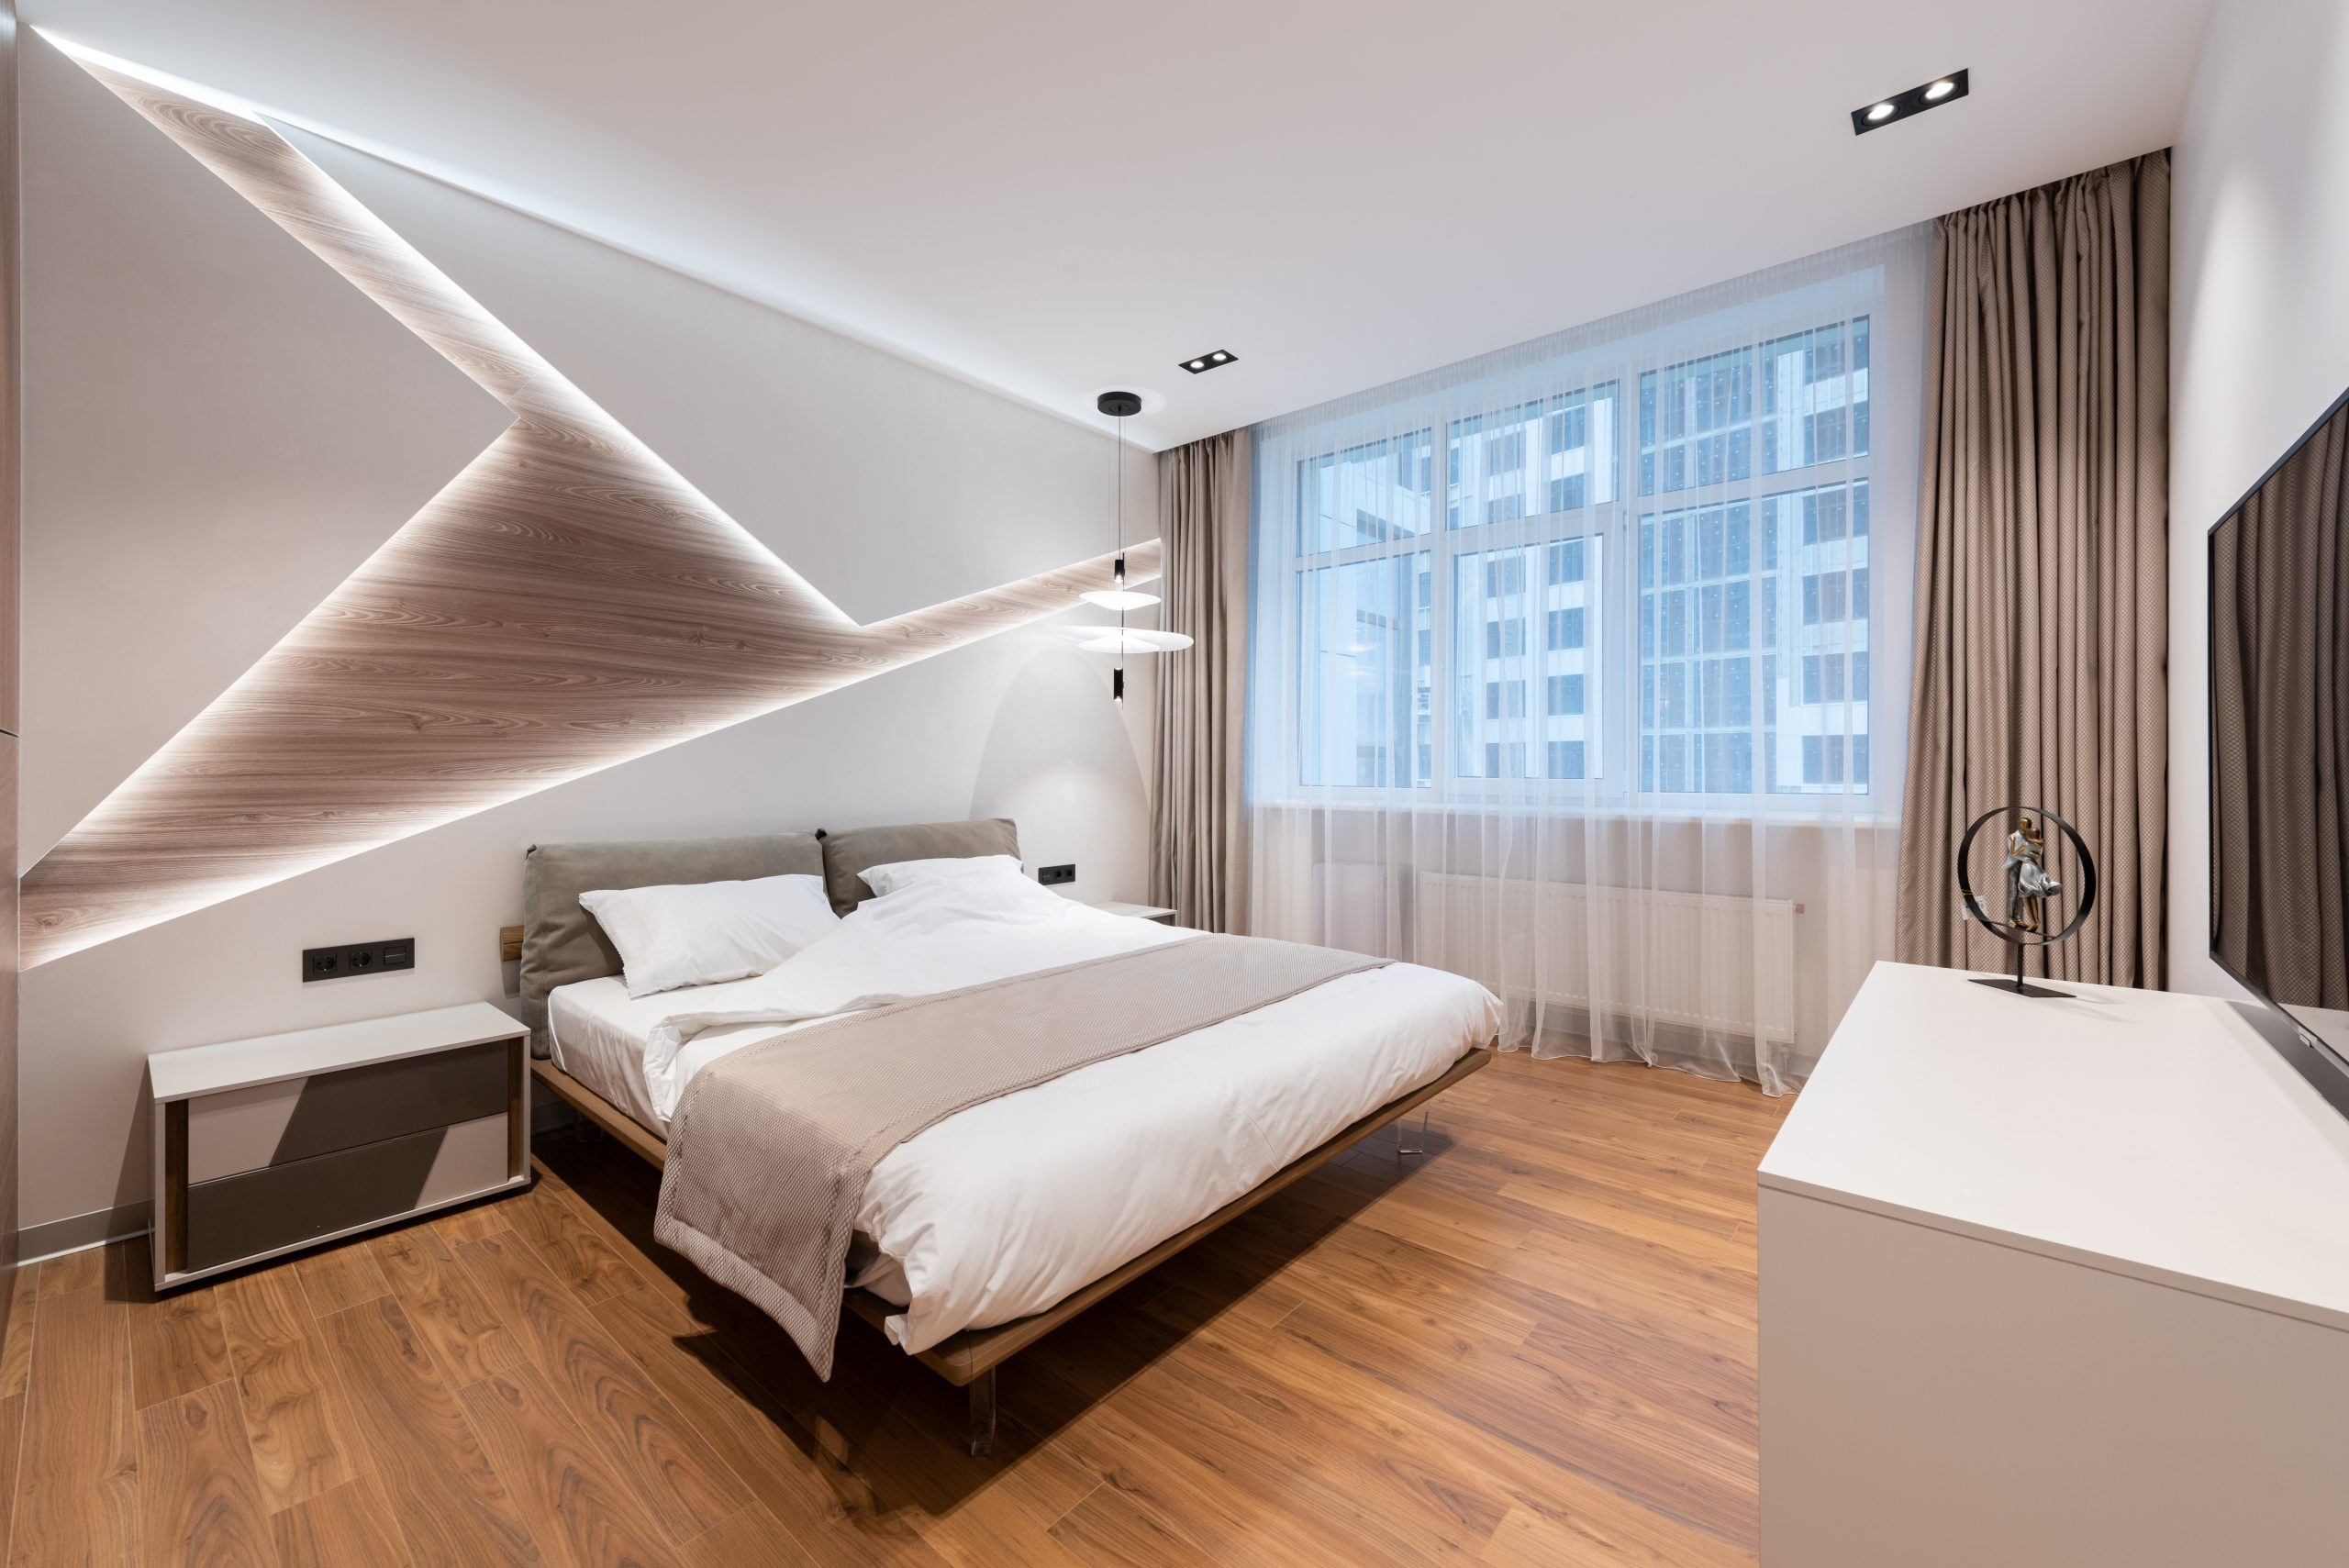 spectaculaire plafondverlichting led verlichting plafond